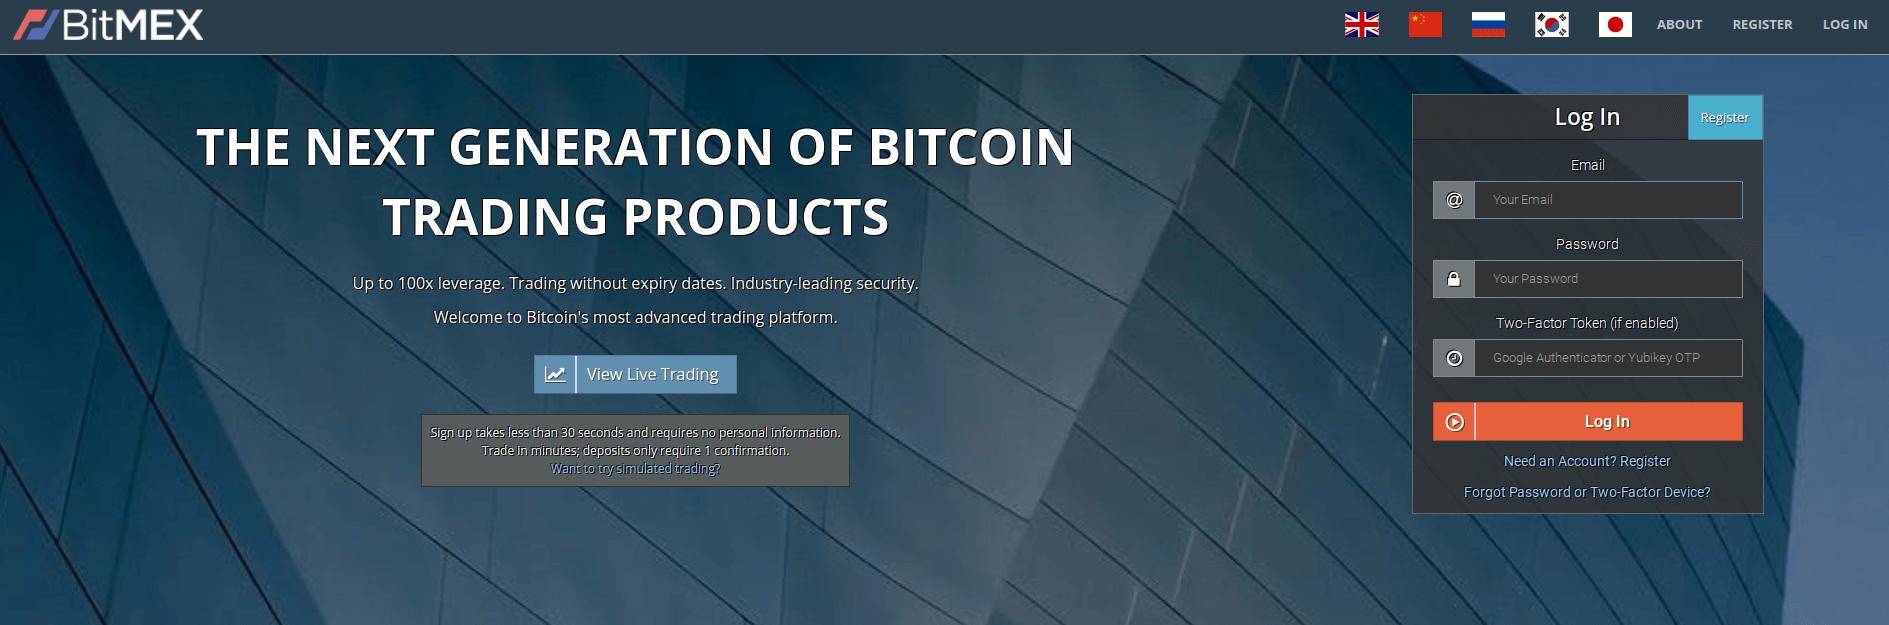 BitMEX Home Page